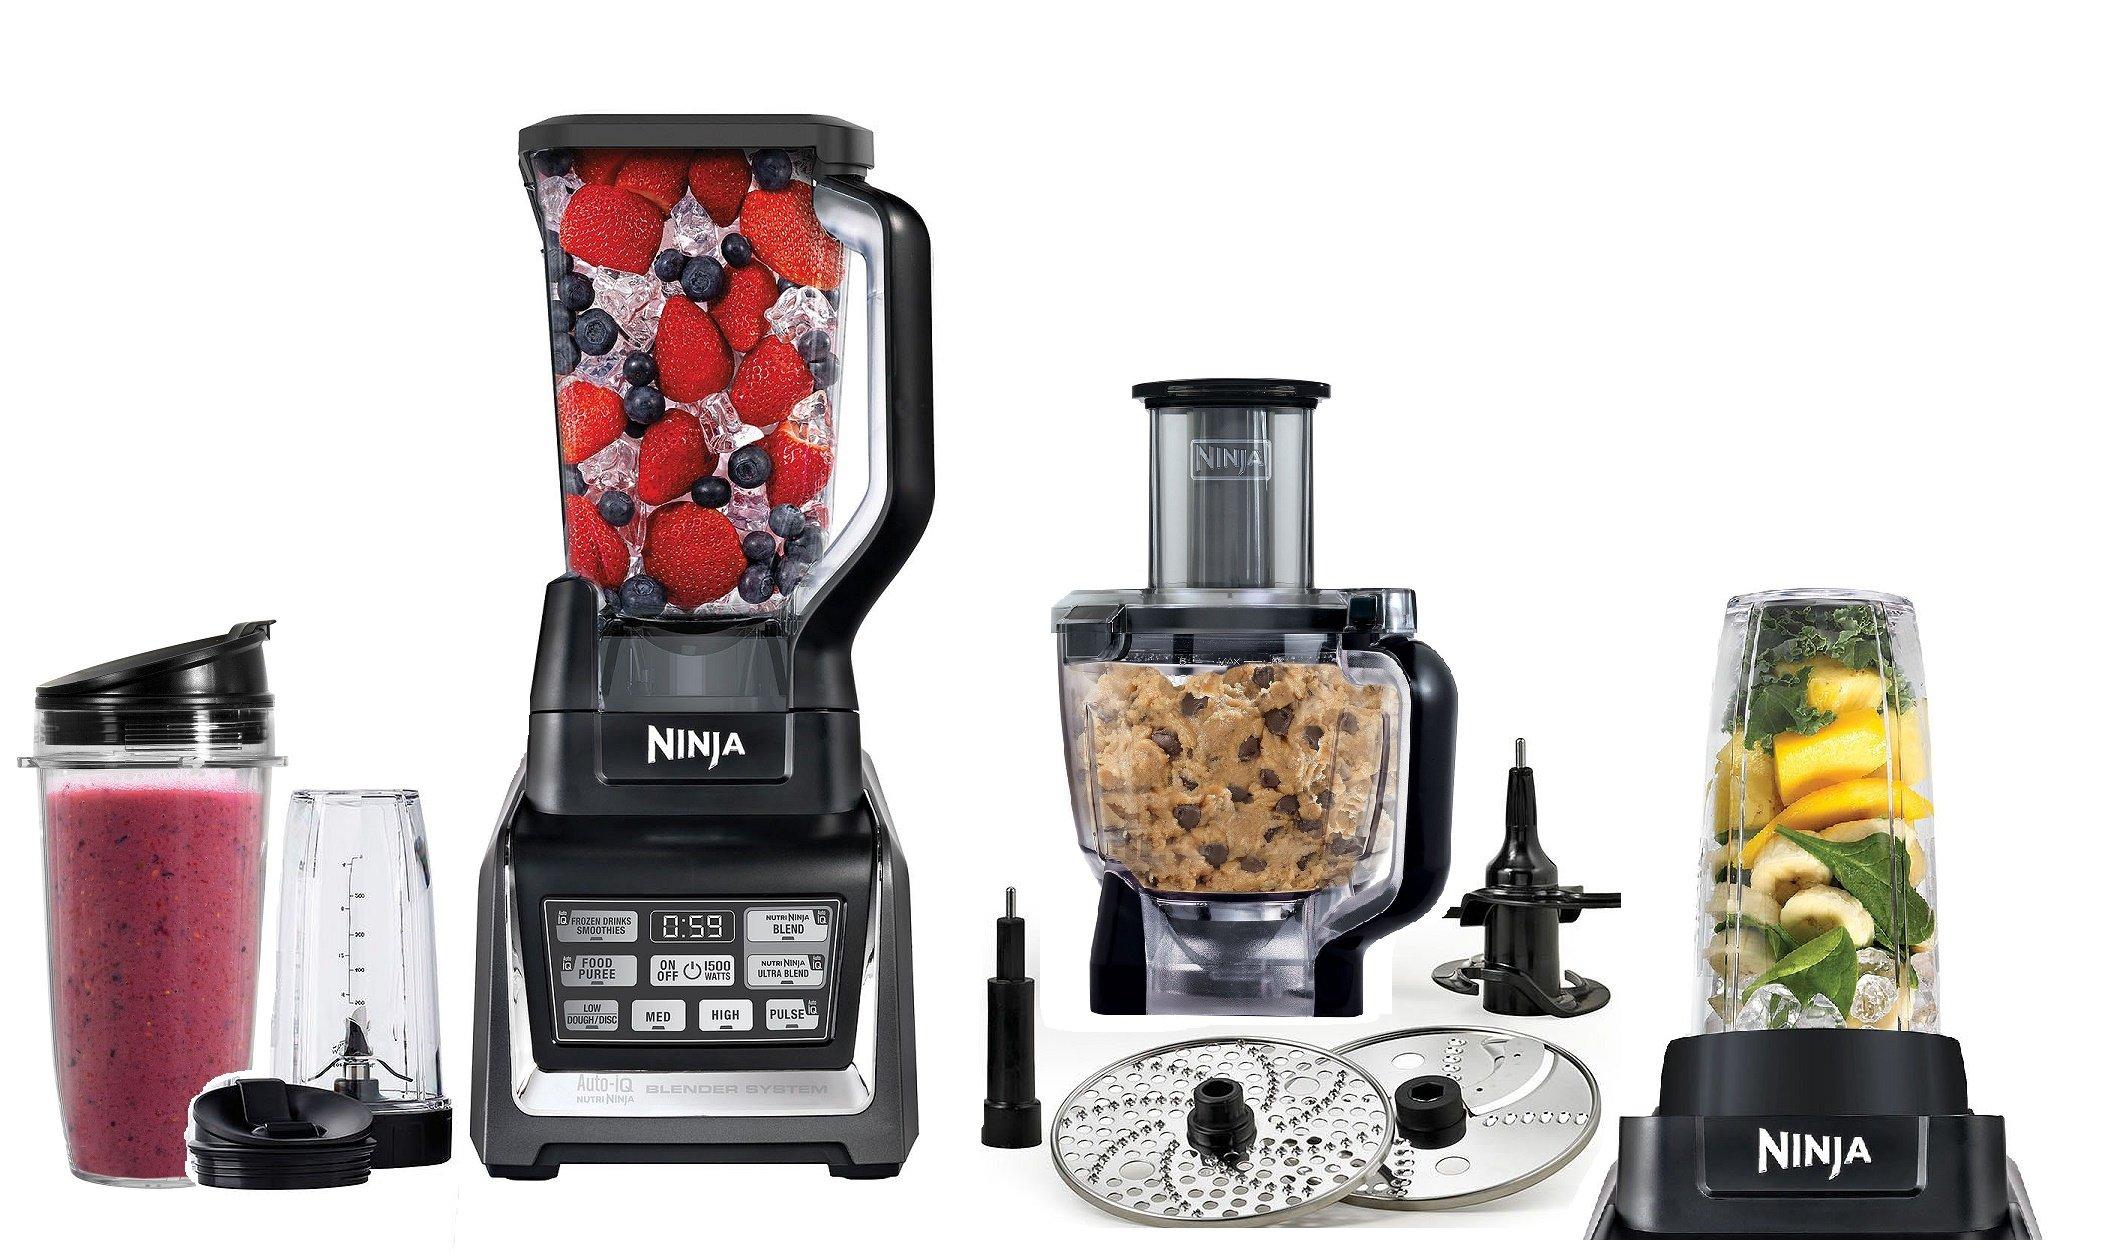 Ninja Mega Kitchen System, 1500 Watts, Blending and Food Processing, 1 Base 2 Functions Auto-iQ Technology…